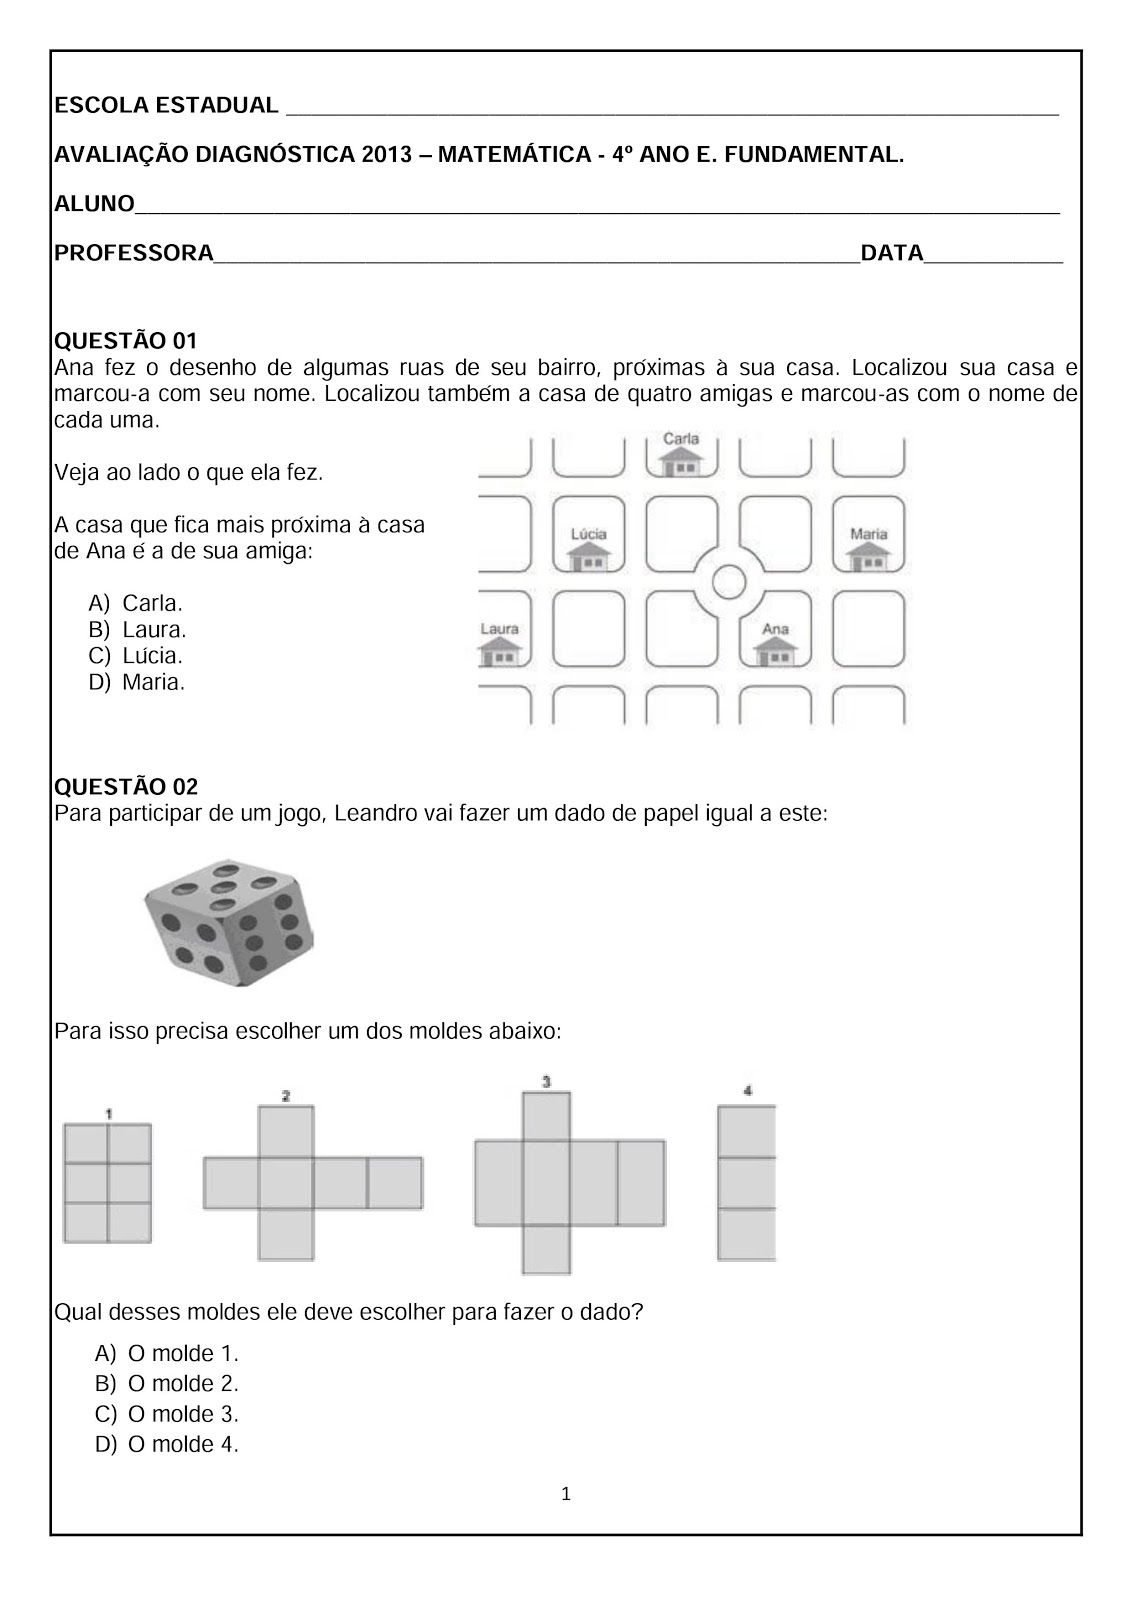 Rosearts Atividades Para Imprimir Atividades Atividades De